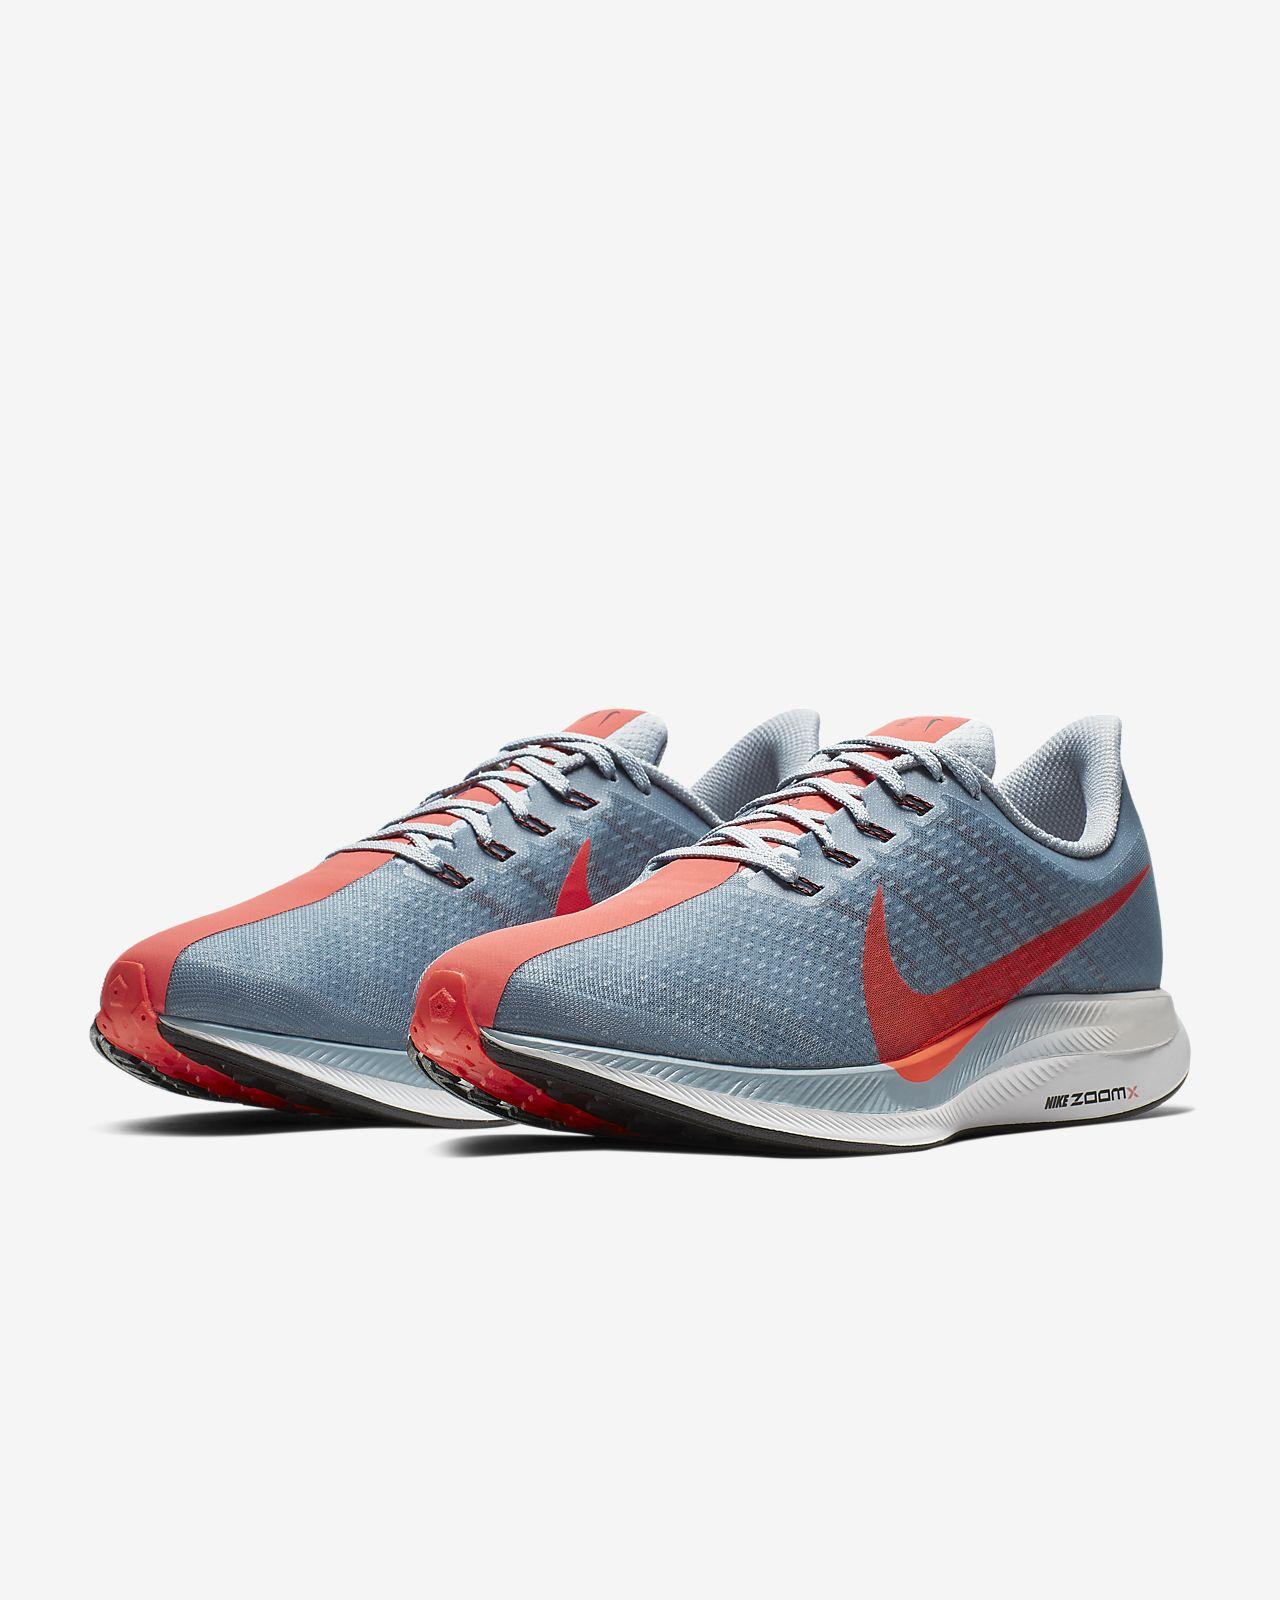 10448942 Мужские беговые кроссовки Nike Zoom Pegasus Turbo. Nike.com RU